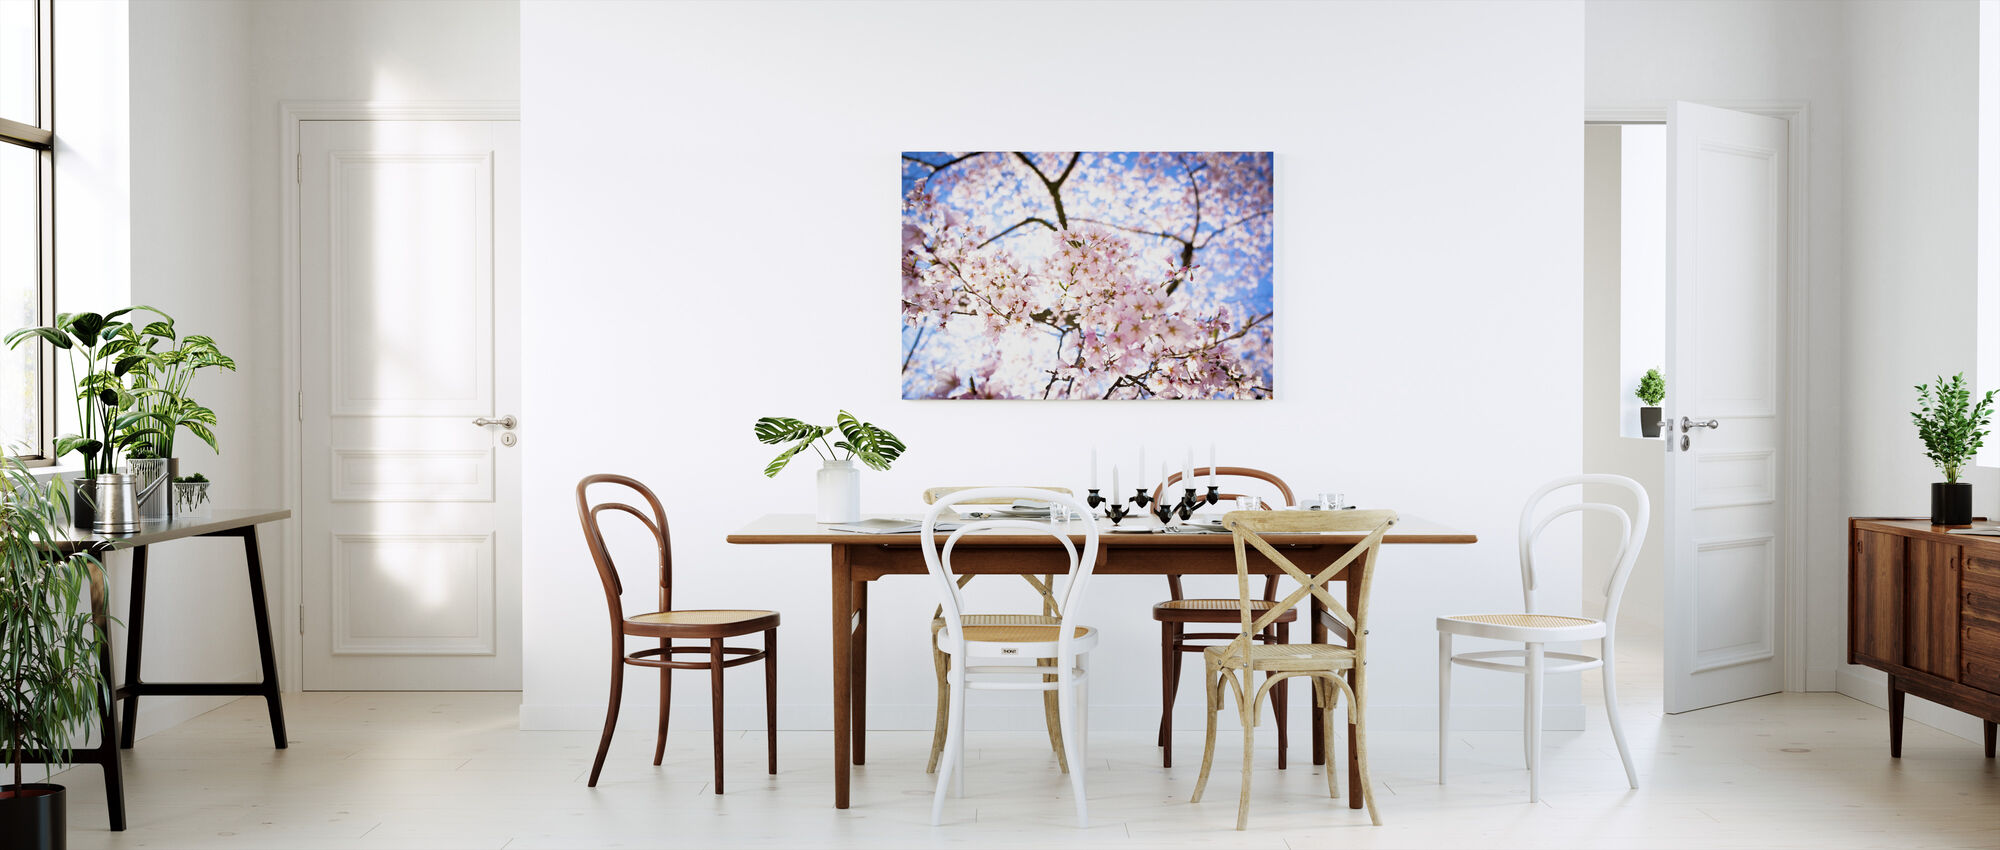 Weeping Cherry Tree - Canvas print - Kitchen